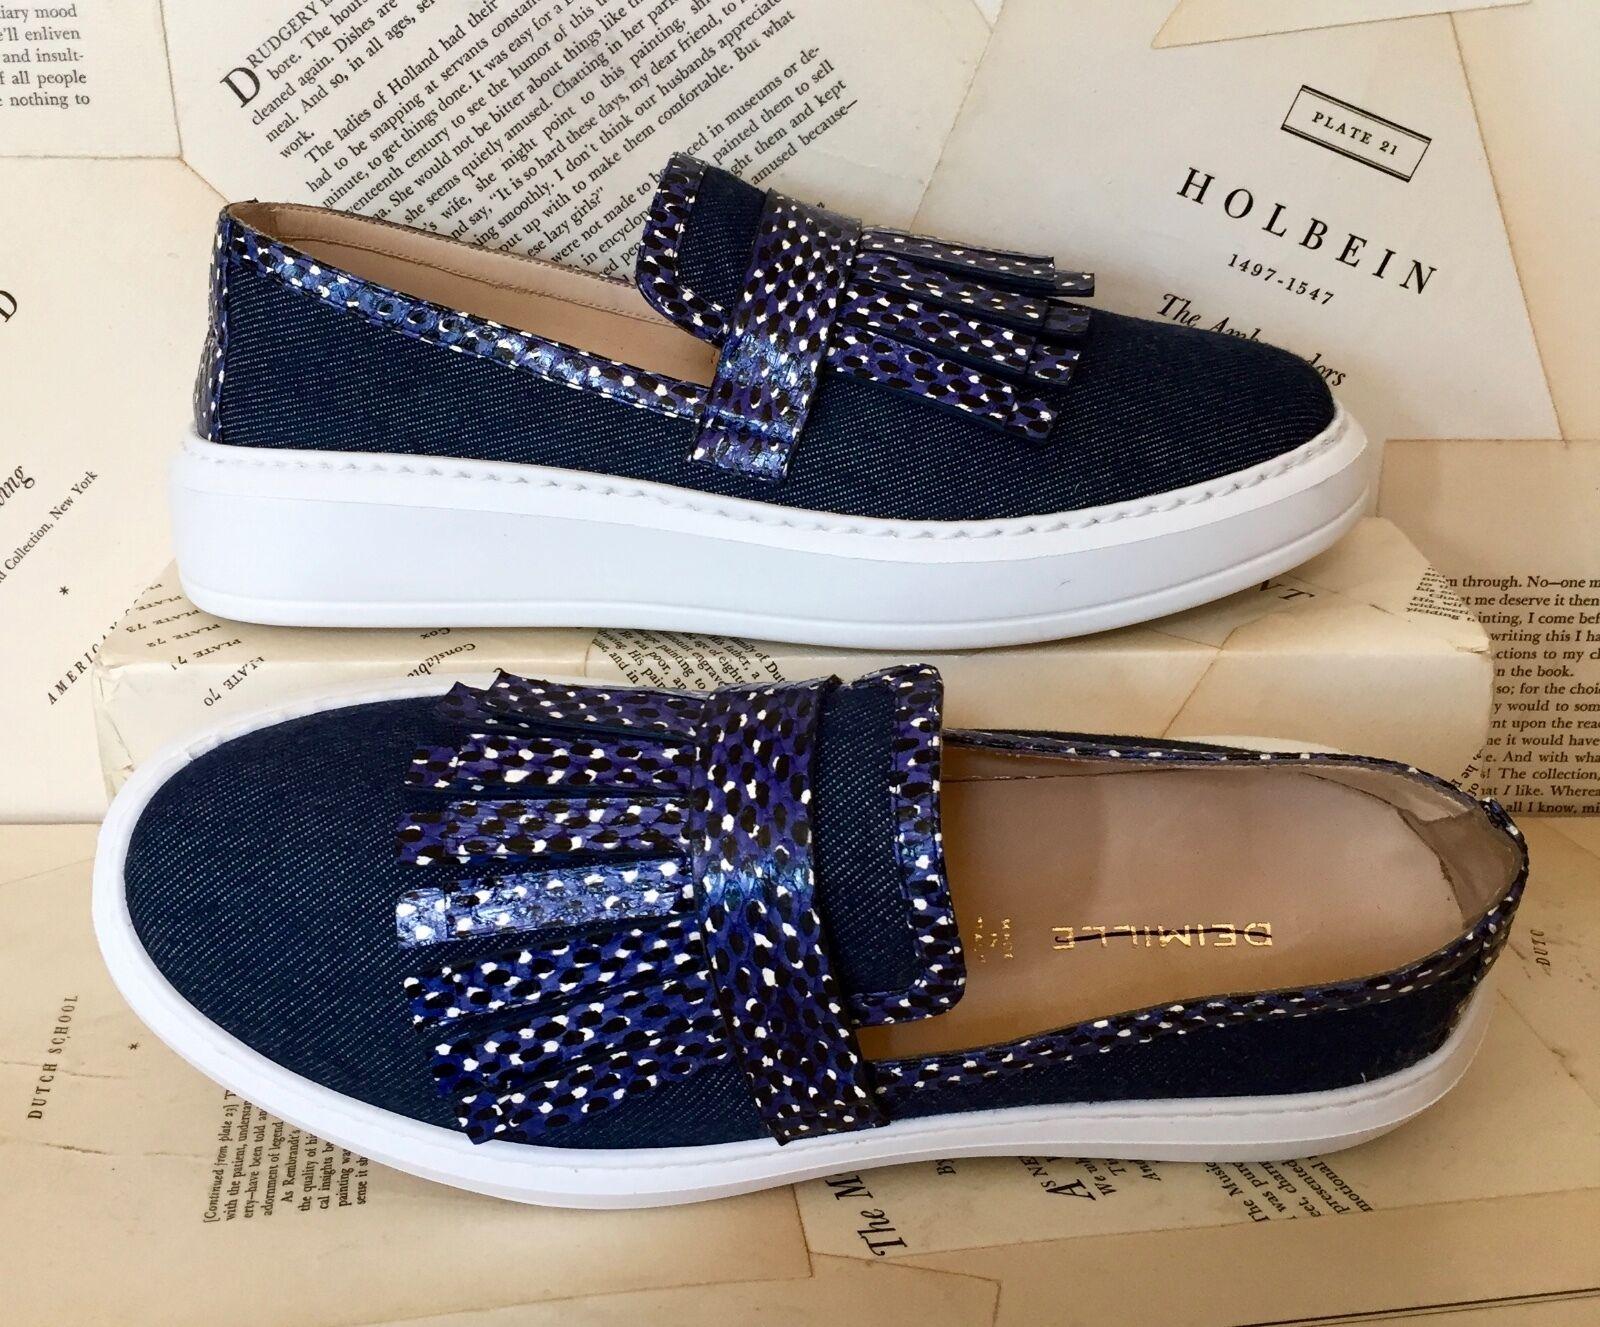 NEW Deimille Denim Leather Fringe Slip On scarpe scarpe scarpe da ginnastica 38  7-7.5 1cb02e